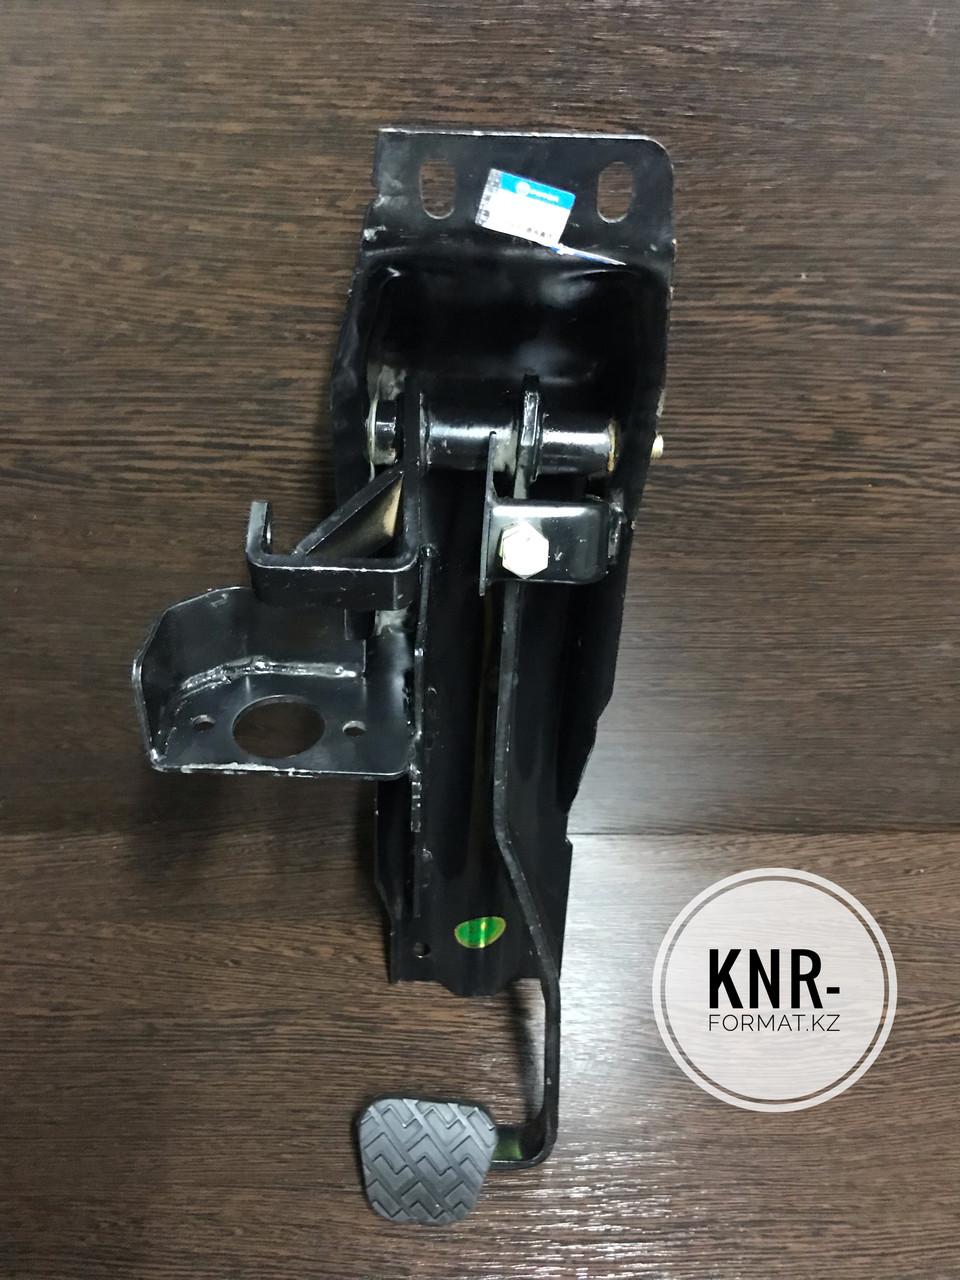 Педаль сцепления FOTON AUMARK BJ1043V9JEA-SB  FOTON BJ5043V9JEA-SB